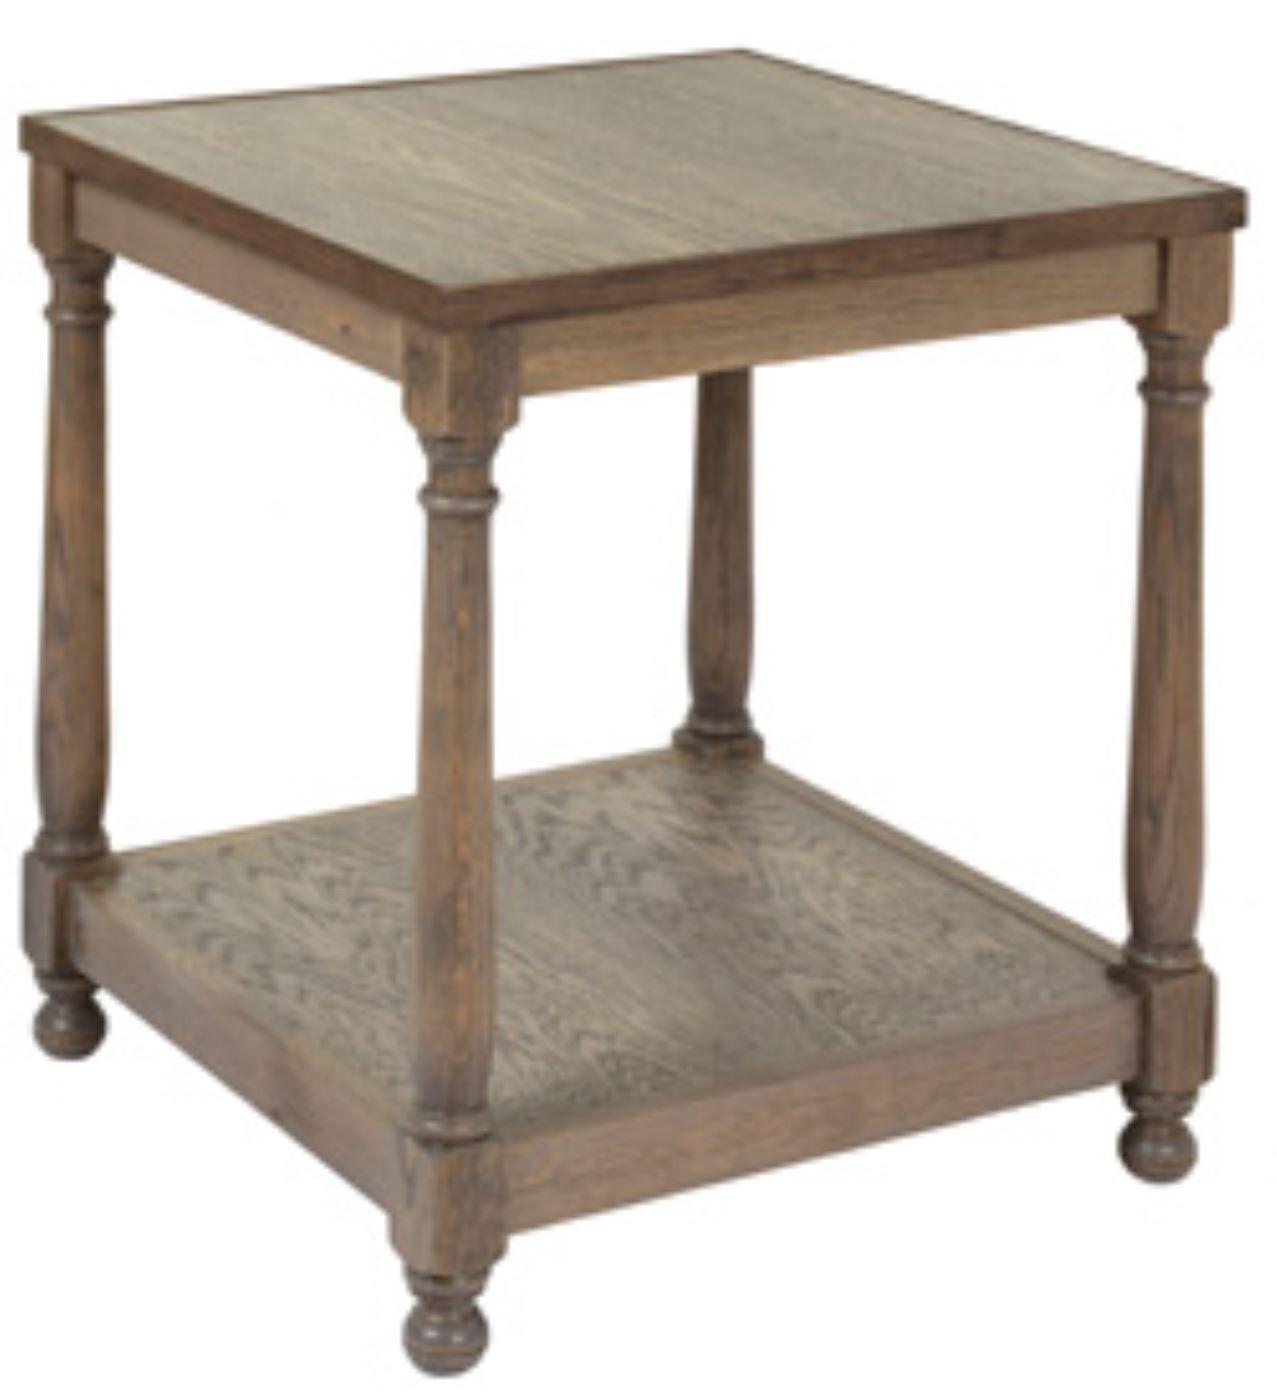 Fenton Table-Square